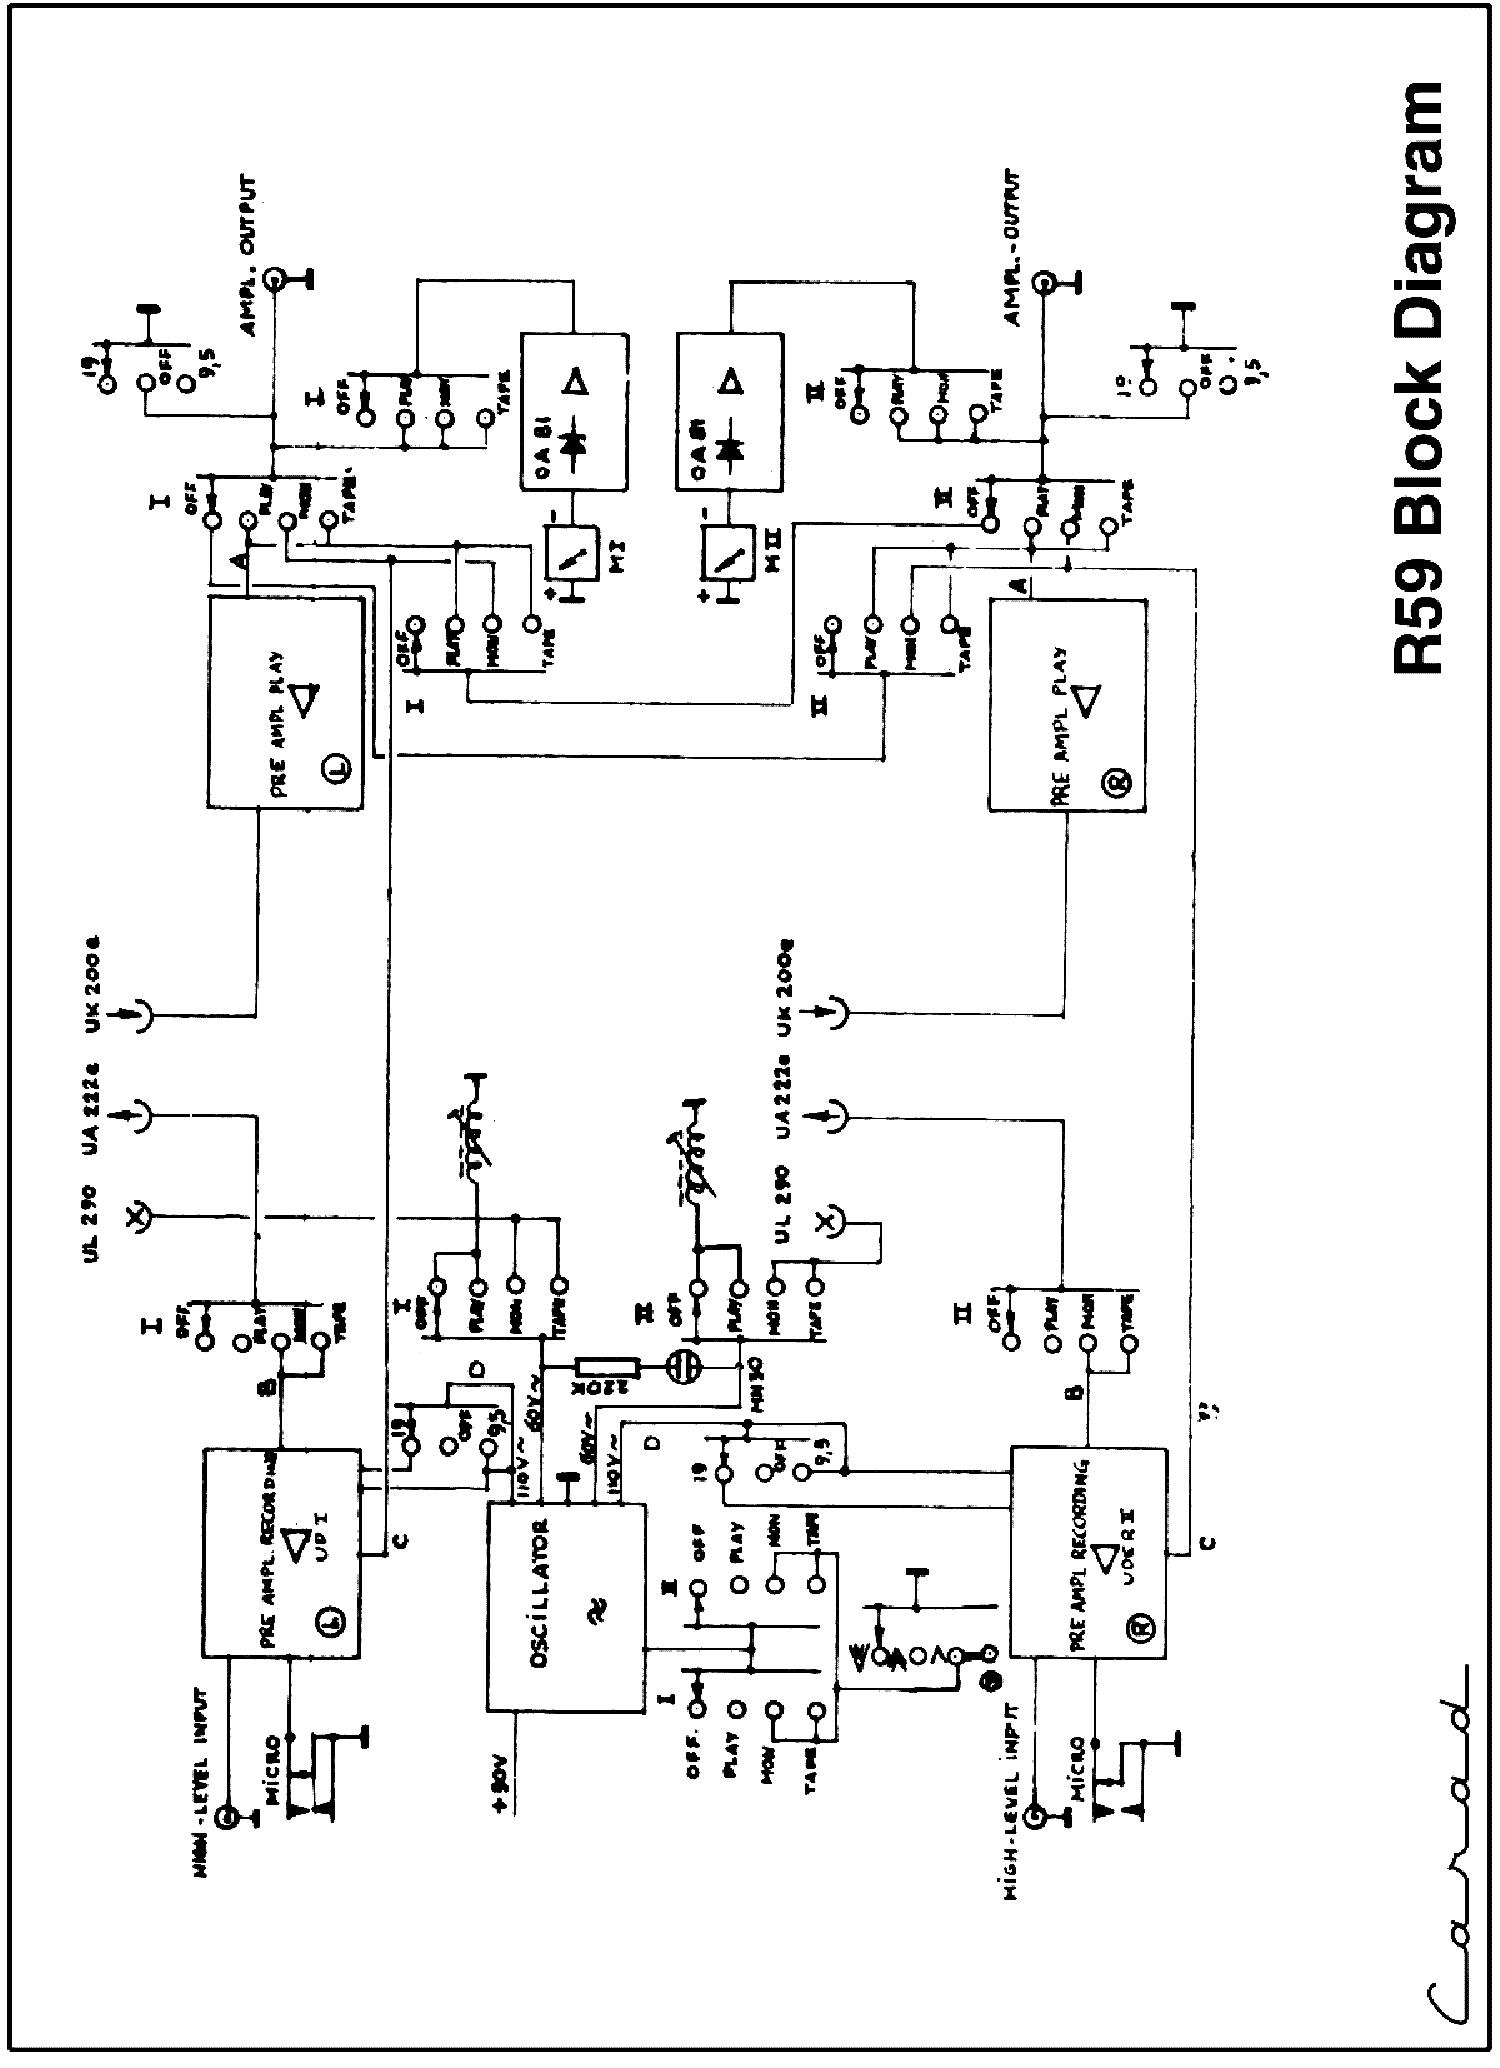 carad r59 tape recorder sch service manual download